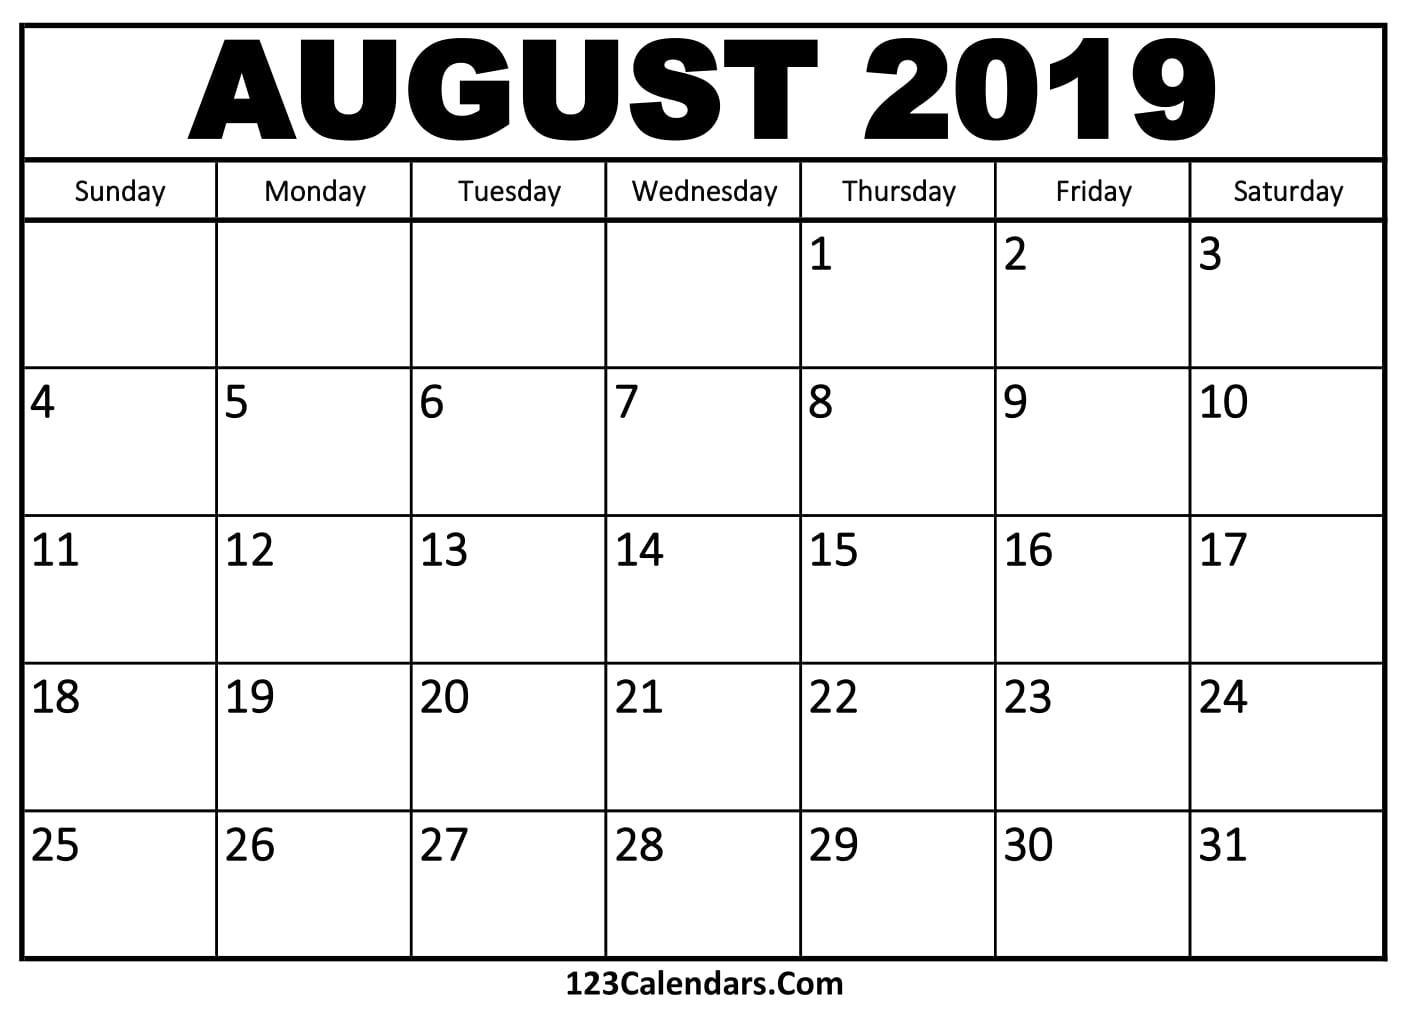 August 2019 Printable Calendar | 123Calendars